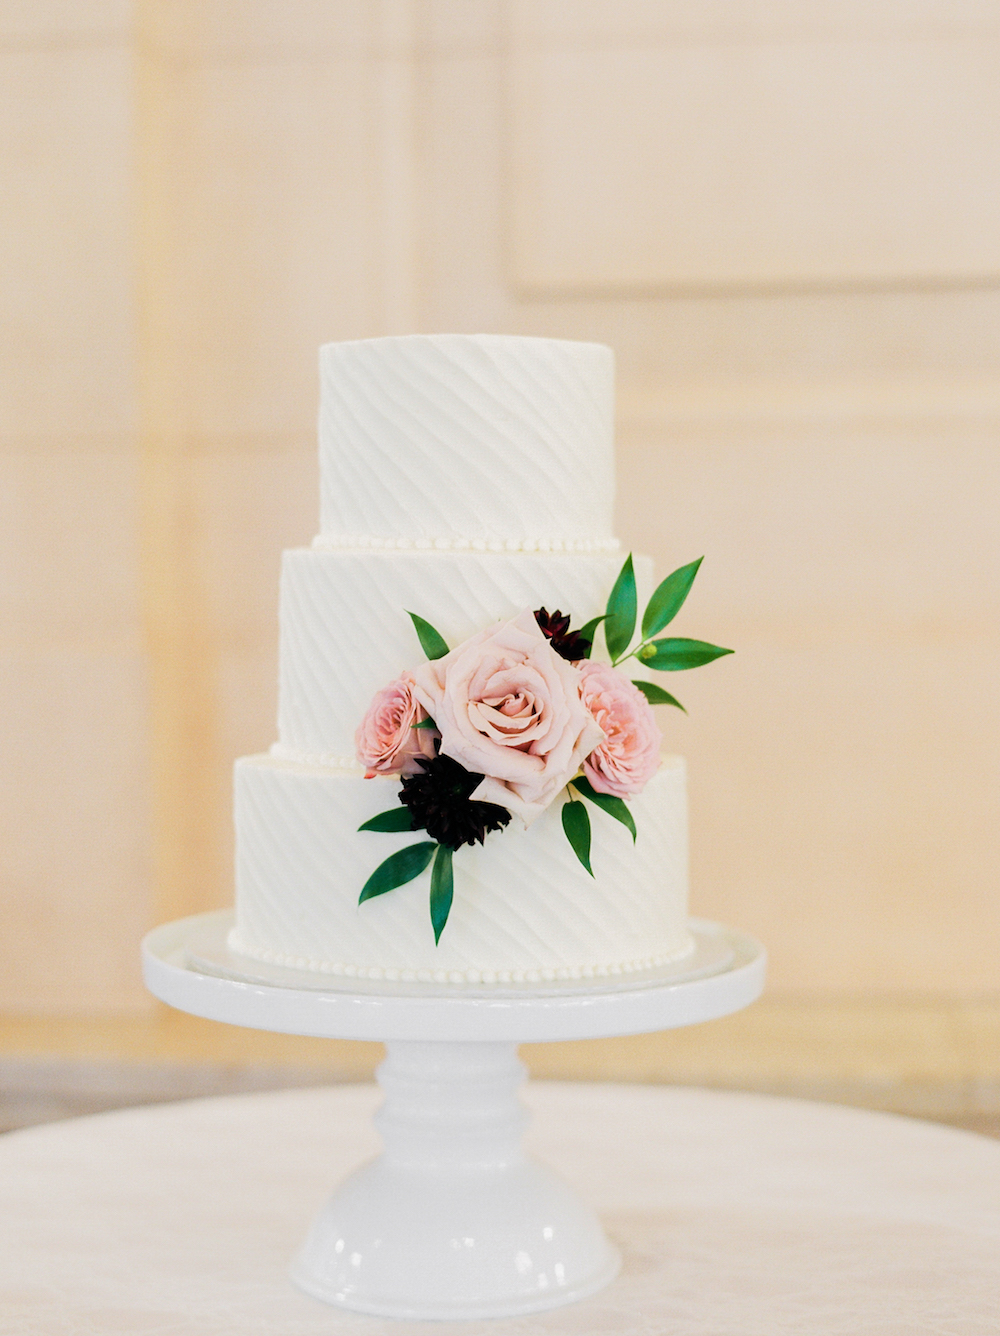 Simple Wedding Cake - Wedding Cake with Fresh Flowers